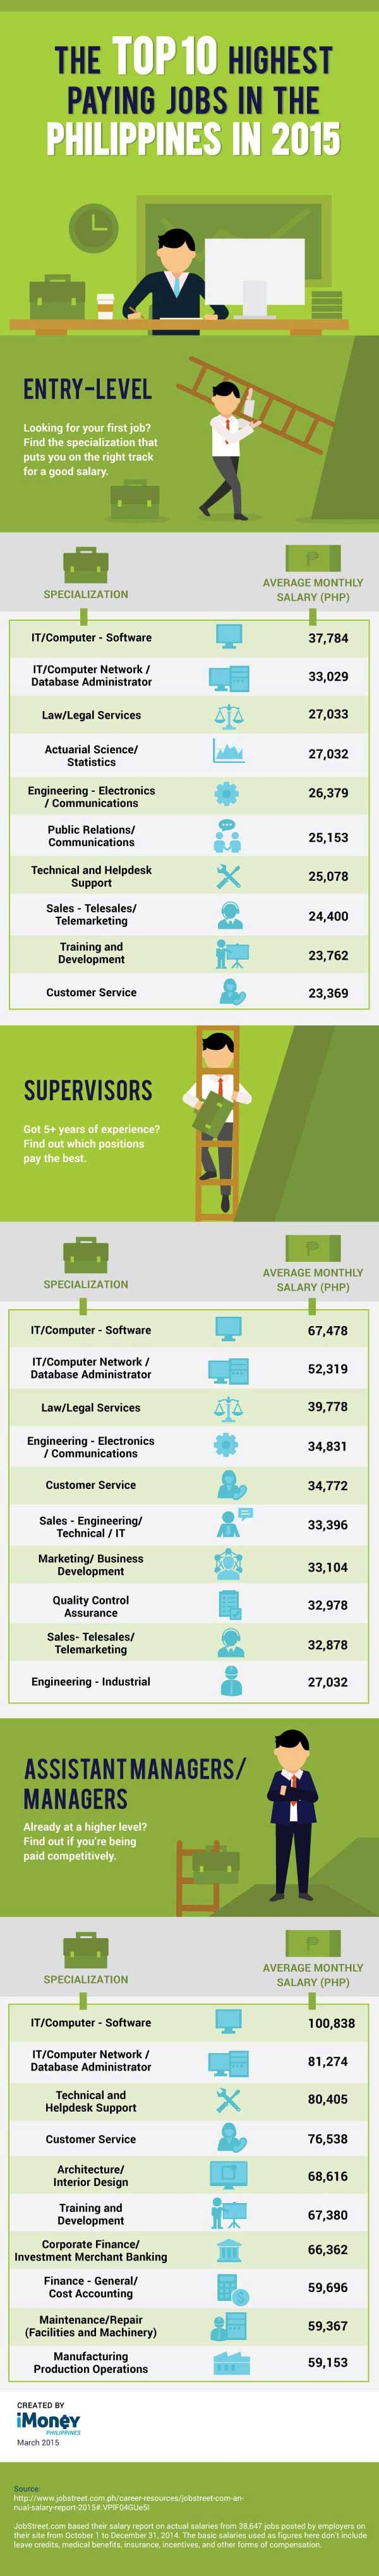 top-10-highest-pay-job-ph-2015